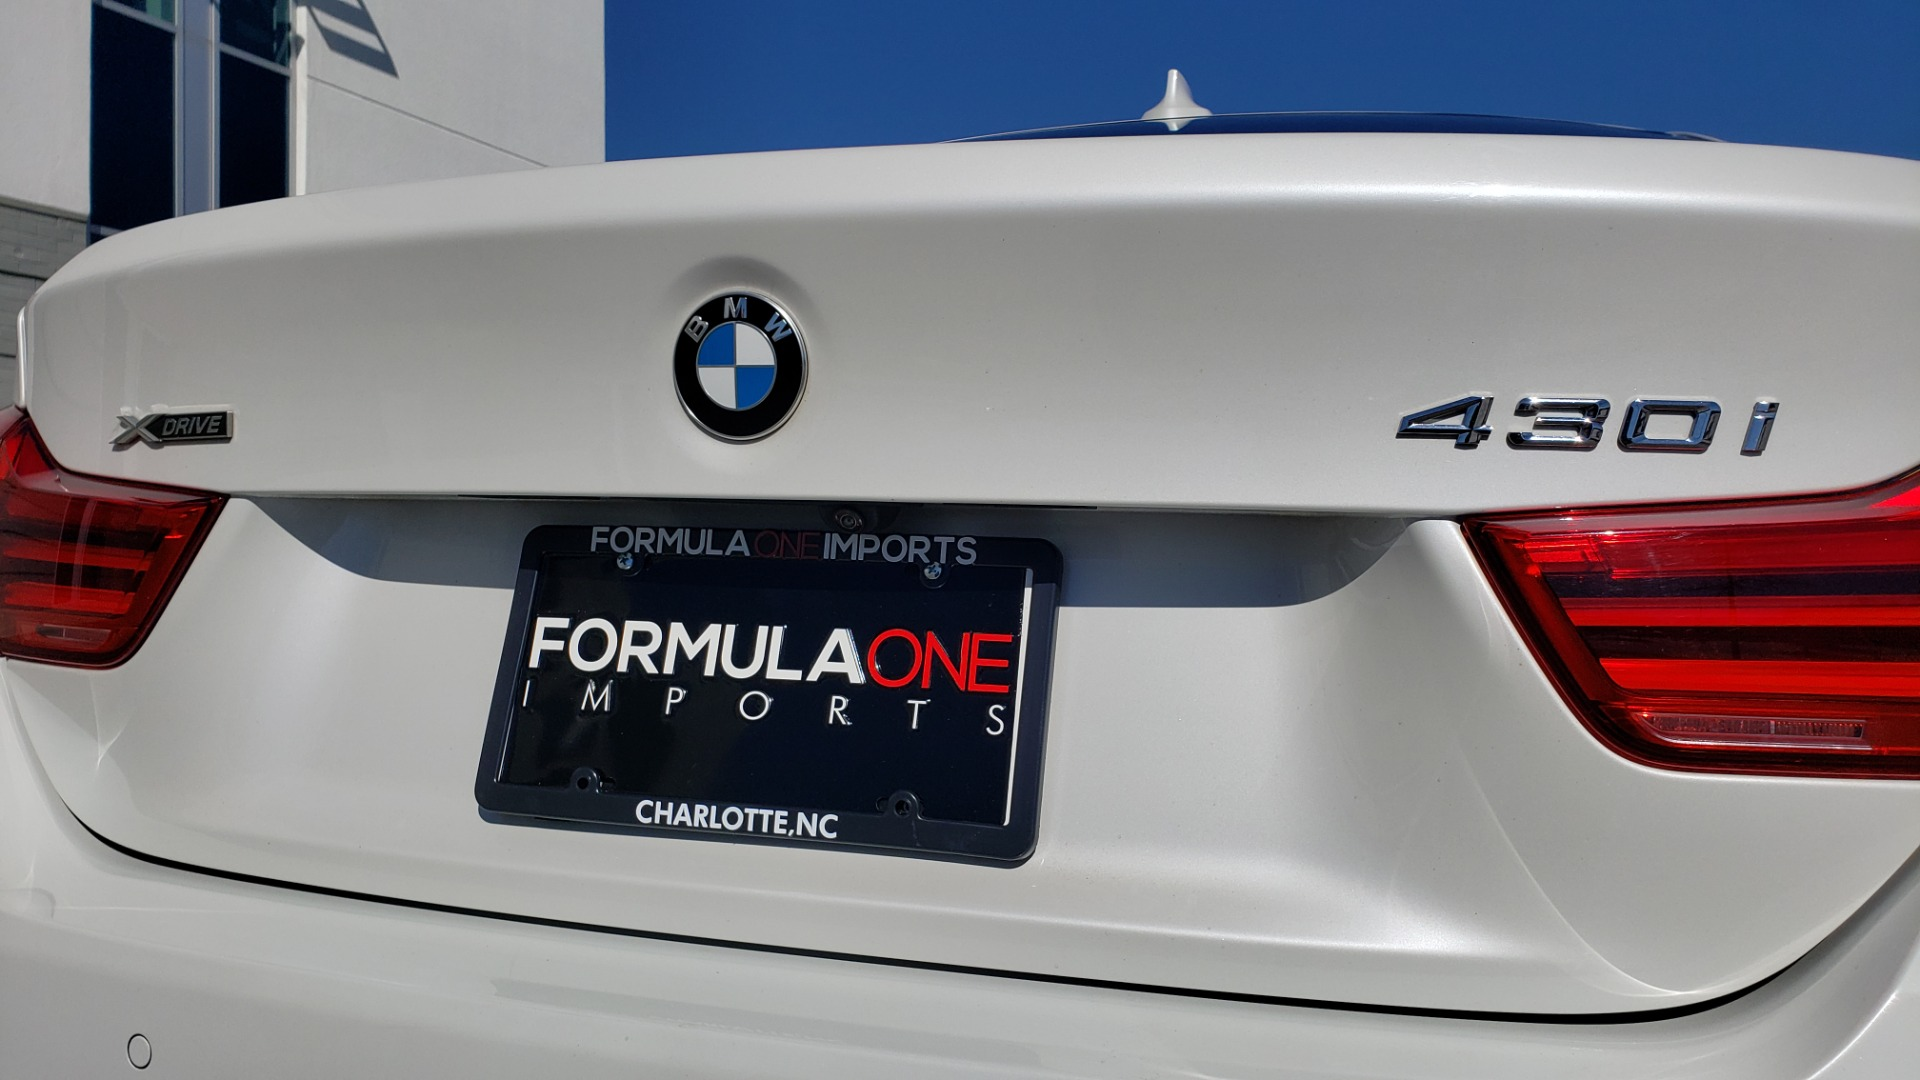 Used 2018 BMW 4 SERIES 430IXDRIVE / PREMIUM / NAV / SUNROOF / ESSENTIALS PKG for sale $27,795 at Formula Imports in Charlotte NC 28227 24